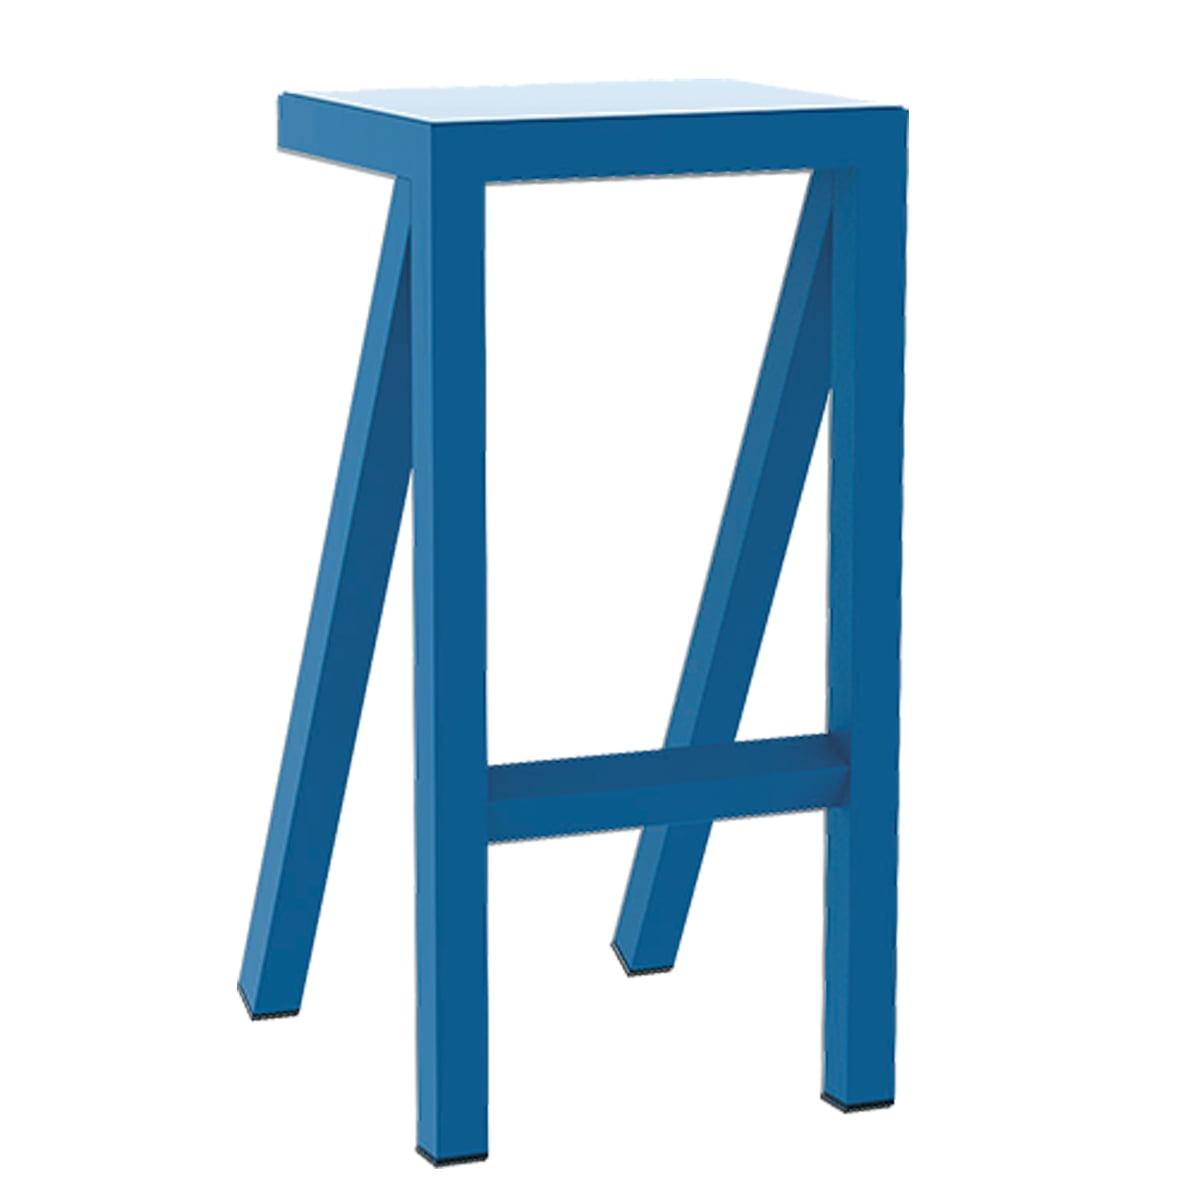 Magis - Bureaurama Küchen-Hocker H 62 cm, blau